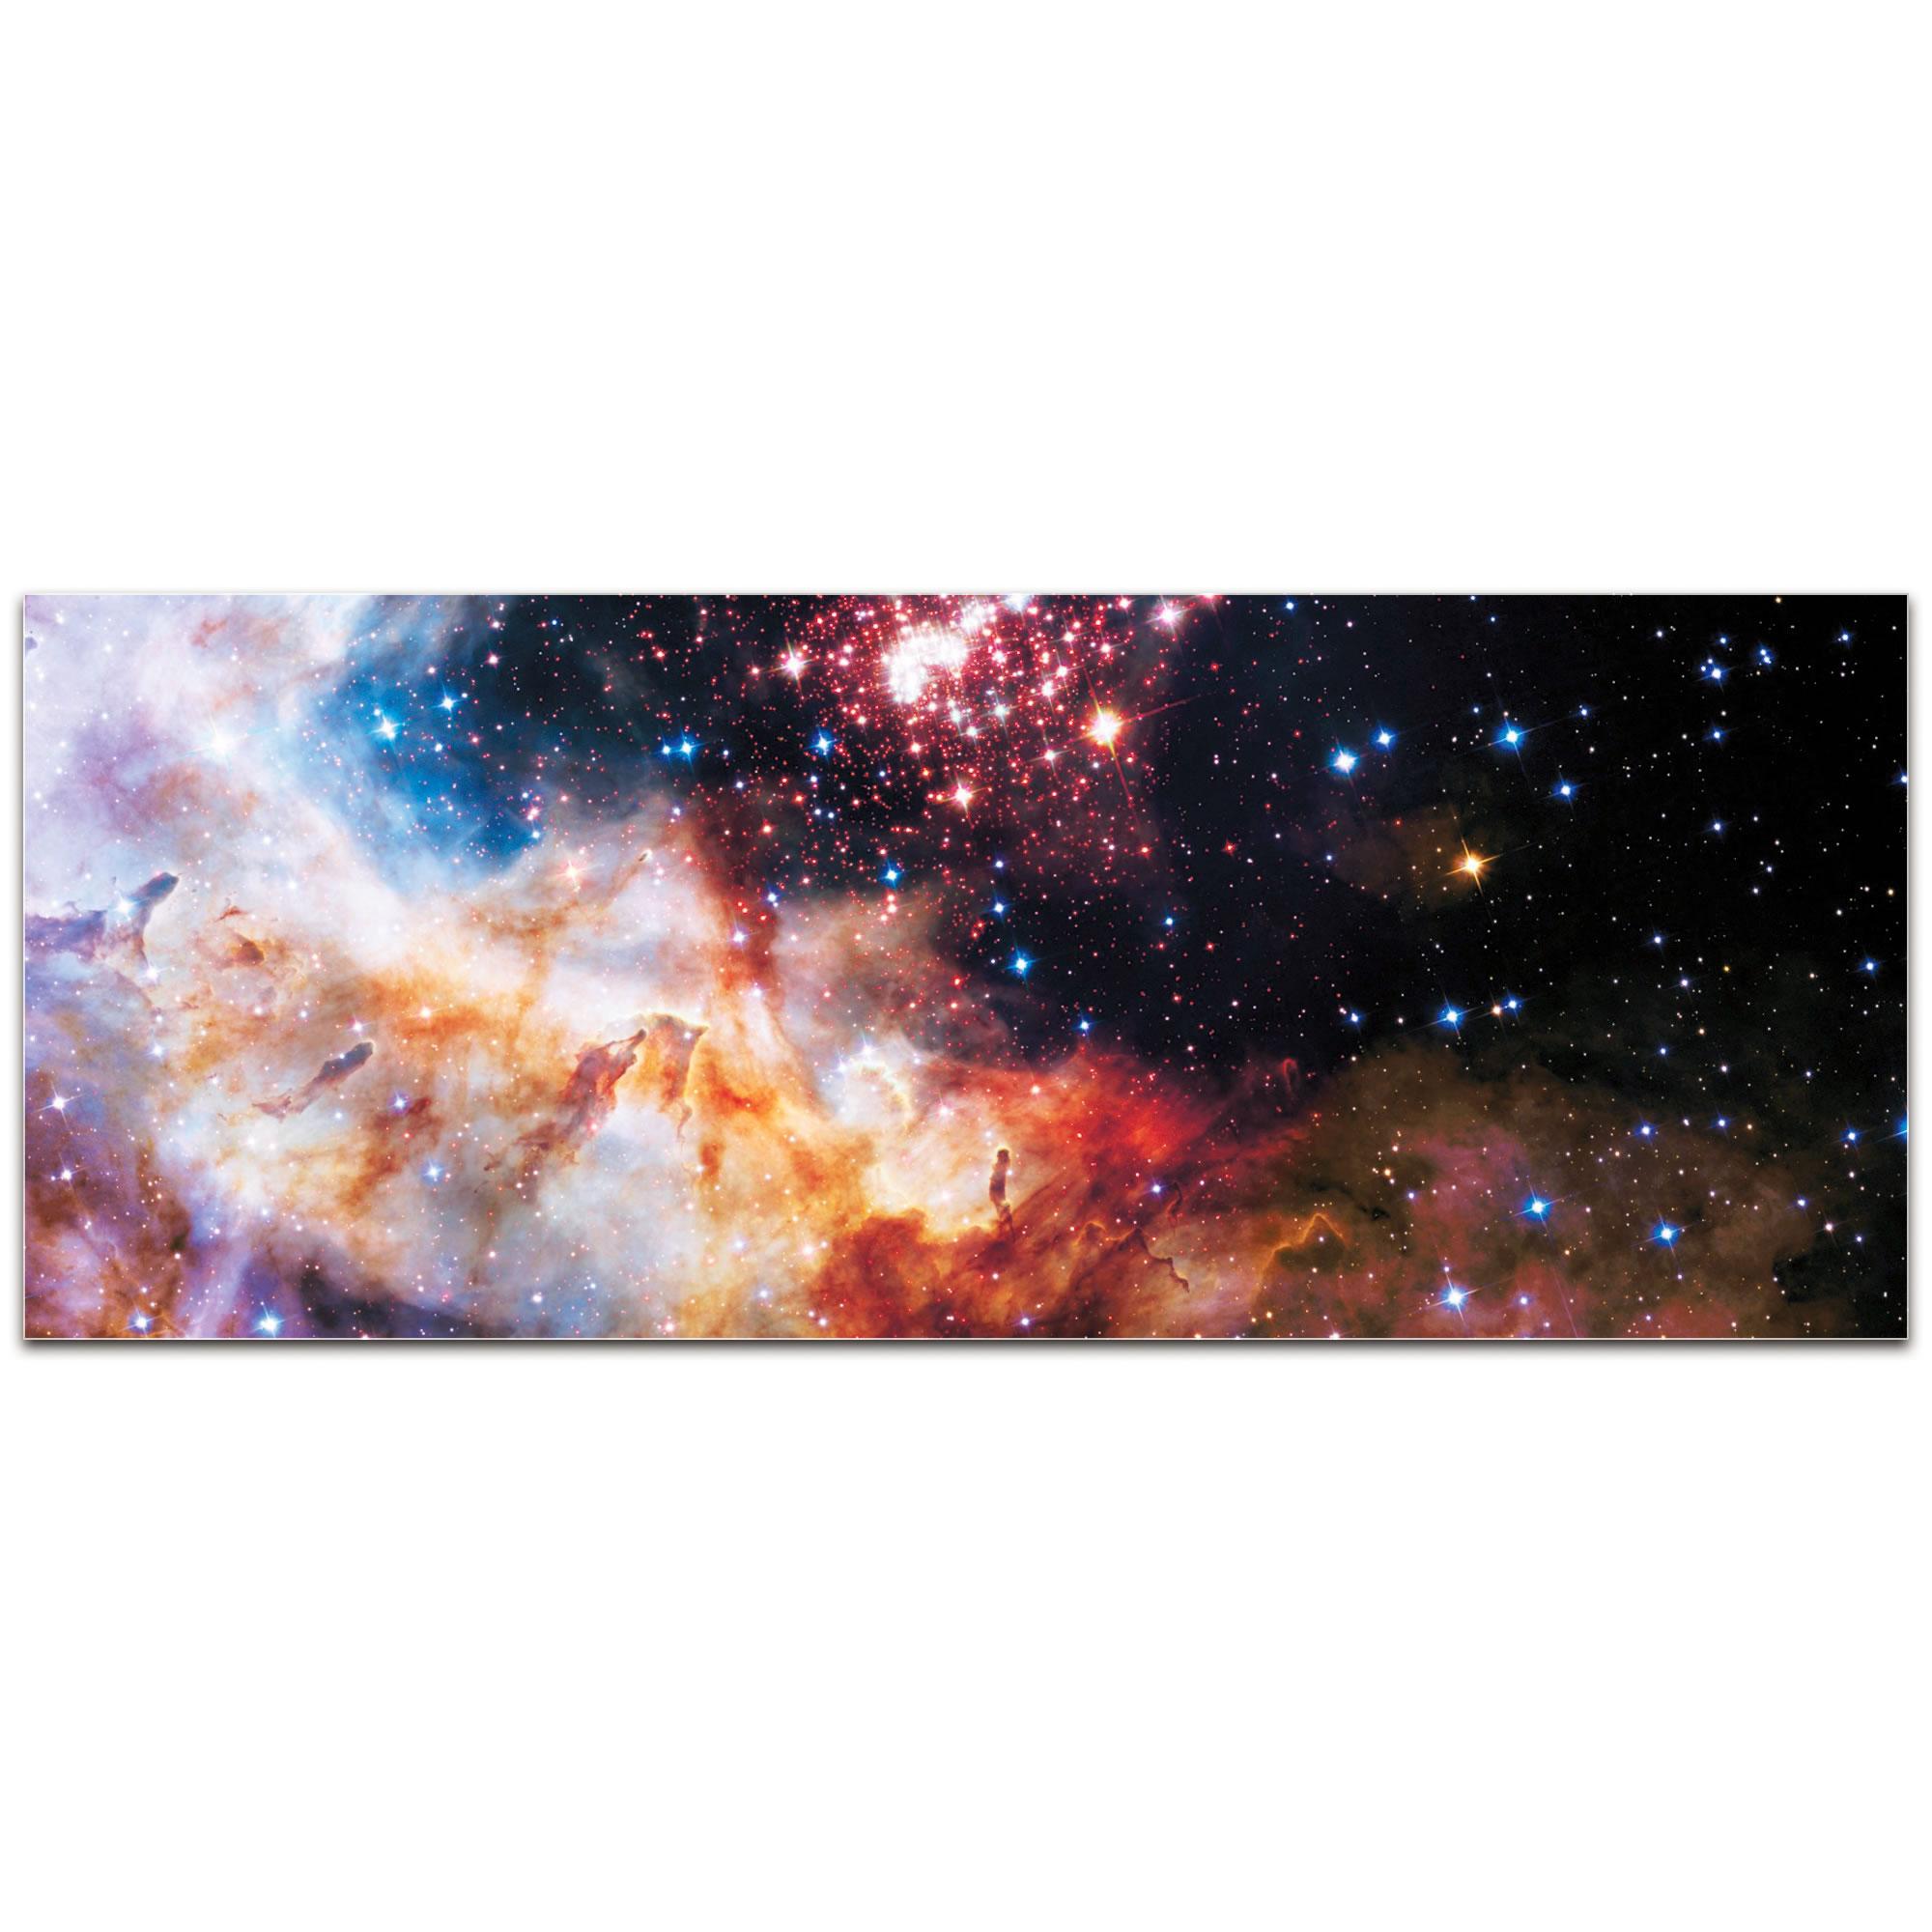 Celestial Fireworks - Modern Wall Decor